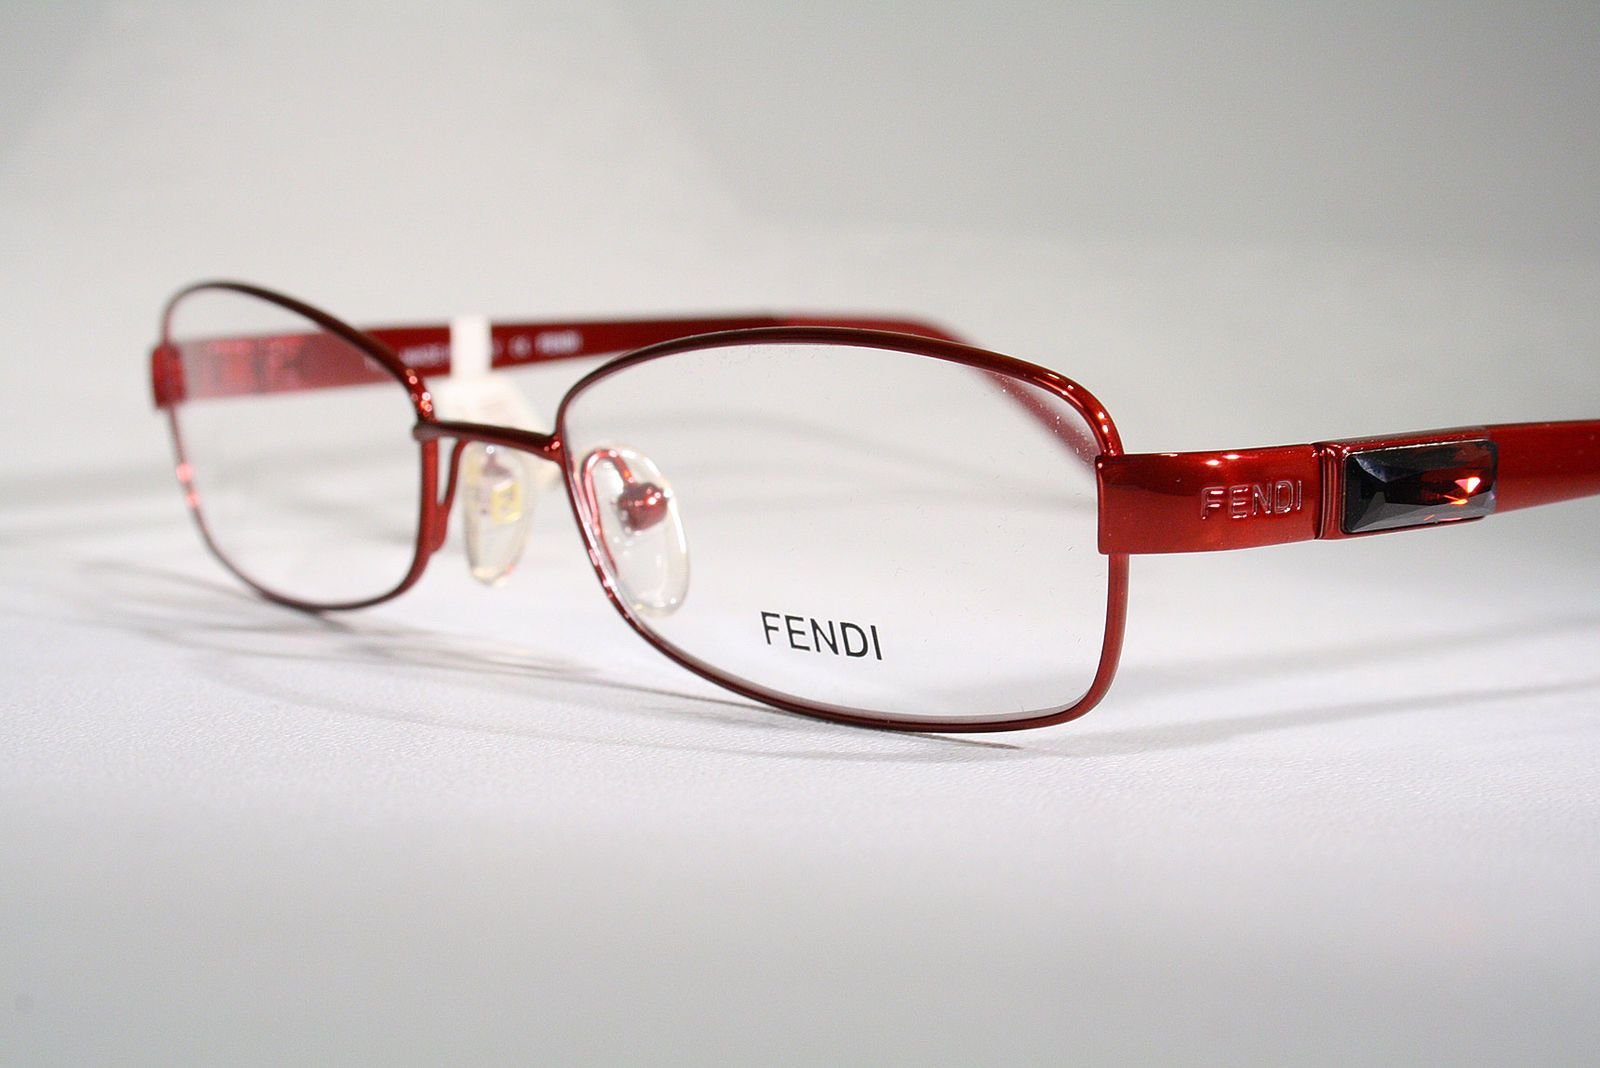 0a8d0720435 FENDI F769R New Women s Burgundy Optical Eyeglasses Frames Glasses with  Case   eBay (RipVanW)